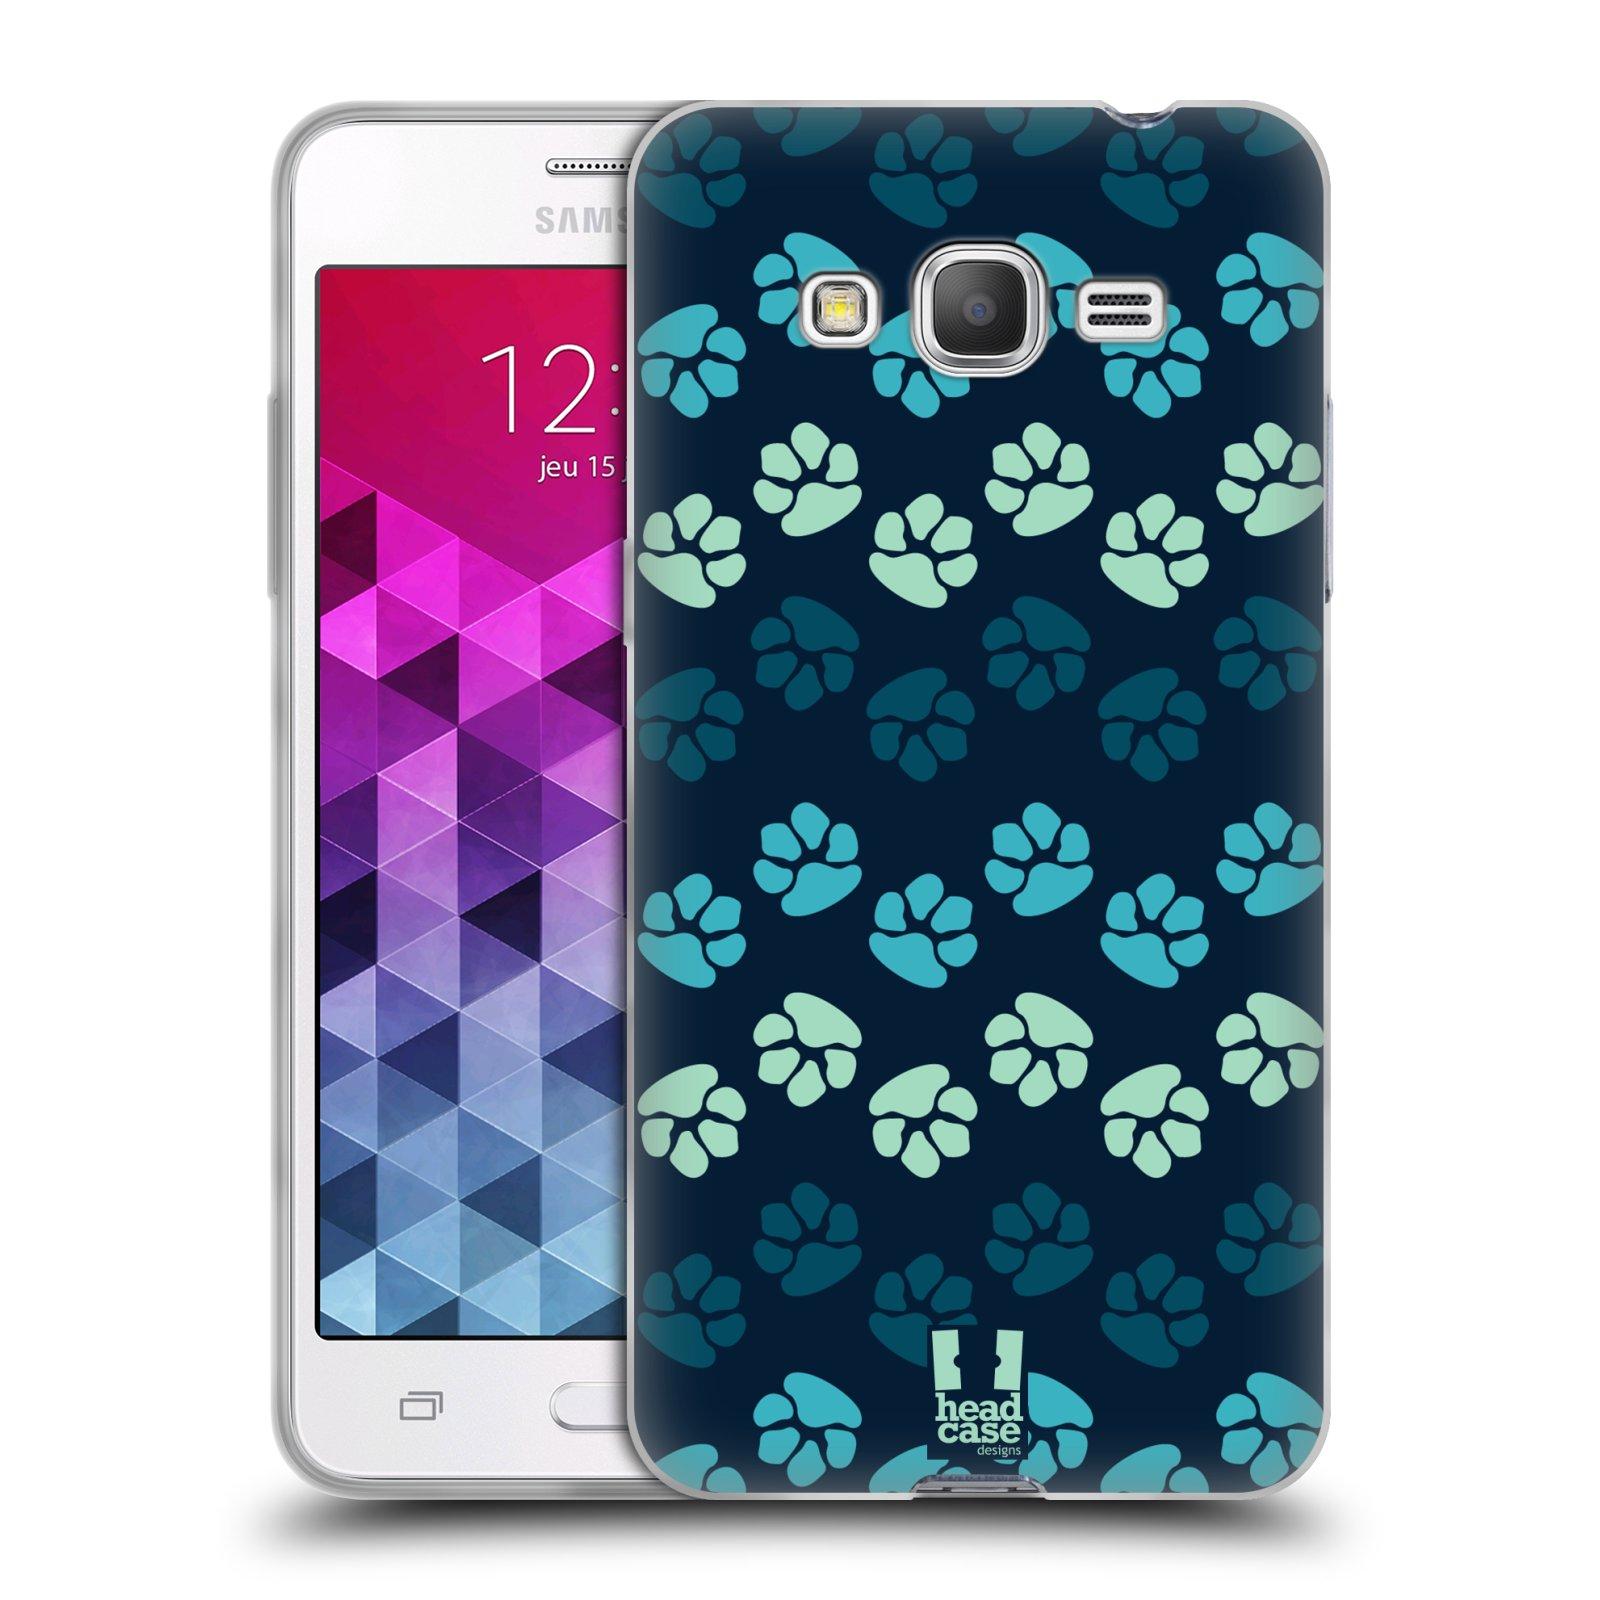 Silikonové pouzdro na mobil Samsung Galaxy Grand Prime VE HEAD CASE TLAPKY MODRÉ (Silikonový kryt či obal na mobilní telefon Samsung Galaxy Grand Prime VE SM-G531F)